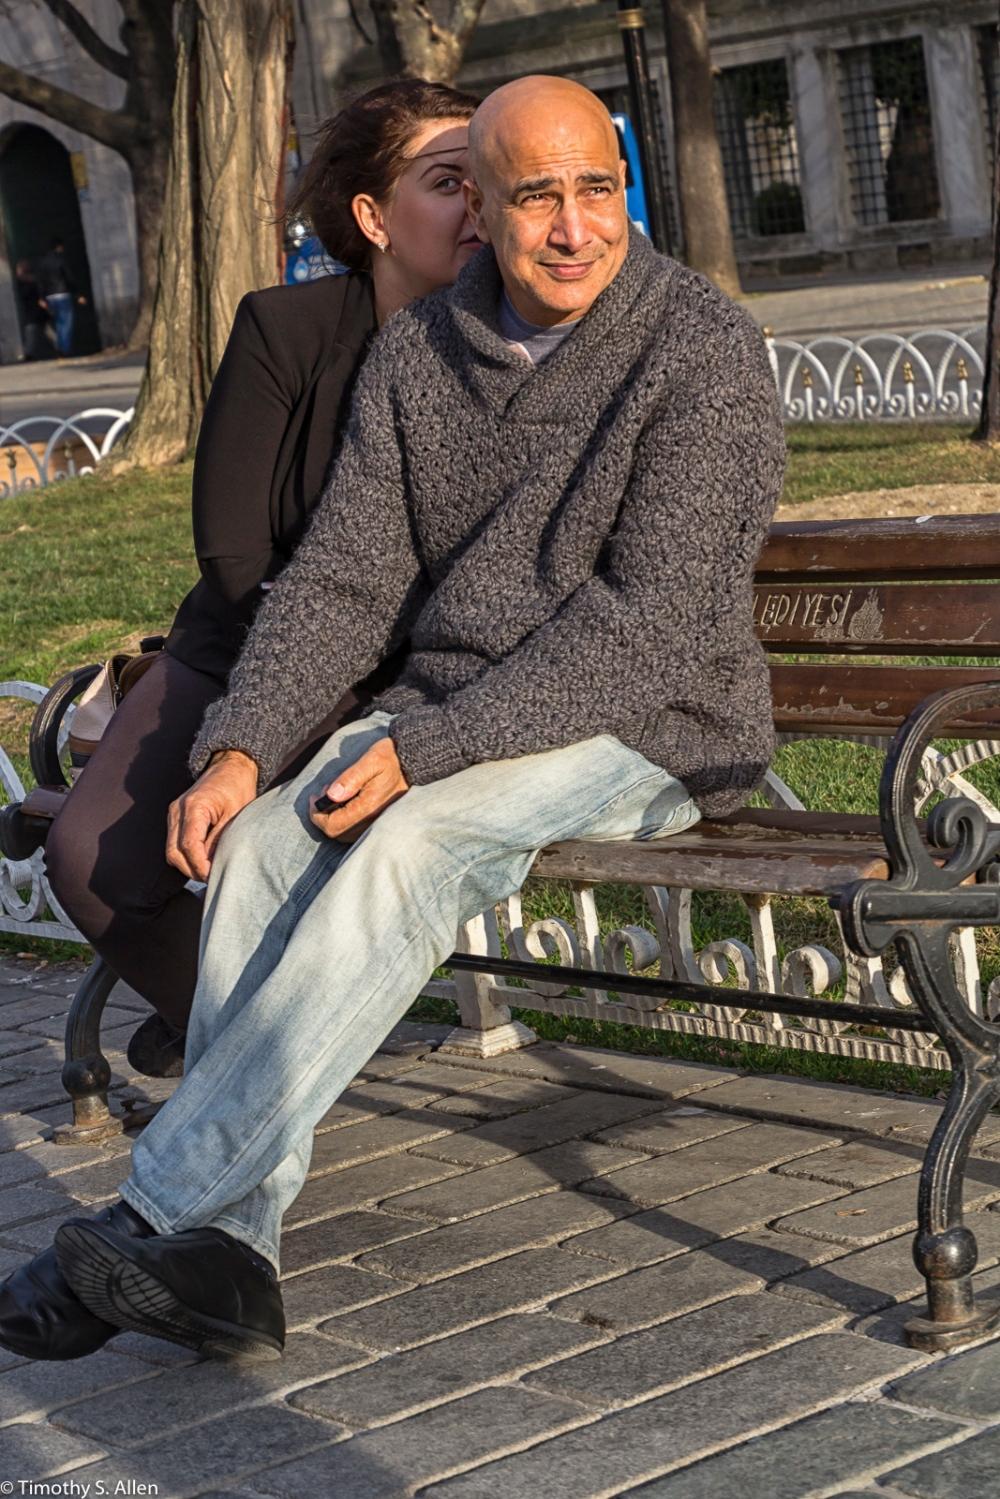 Couple in the Hippodrome Enjoying the Setting Sun. Istanbul, Turkey November 21, 2015